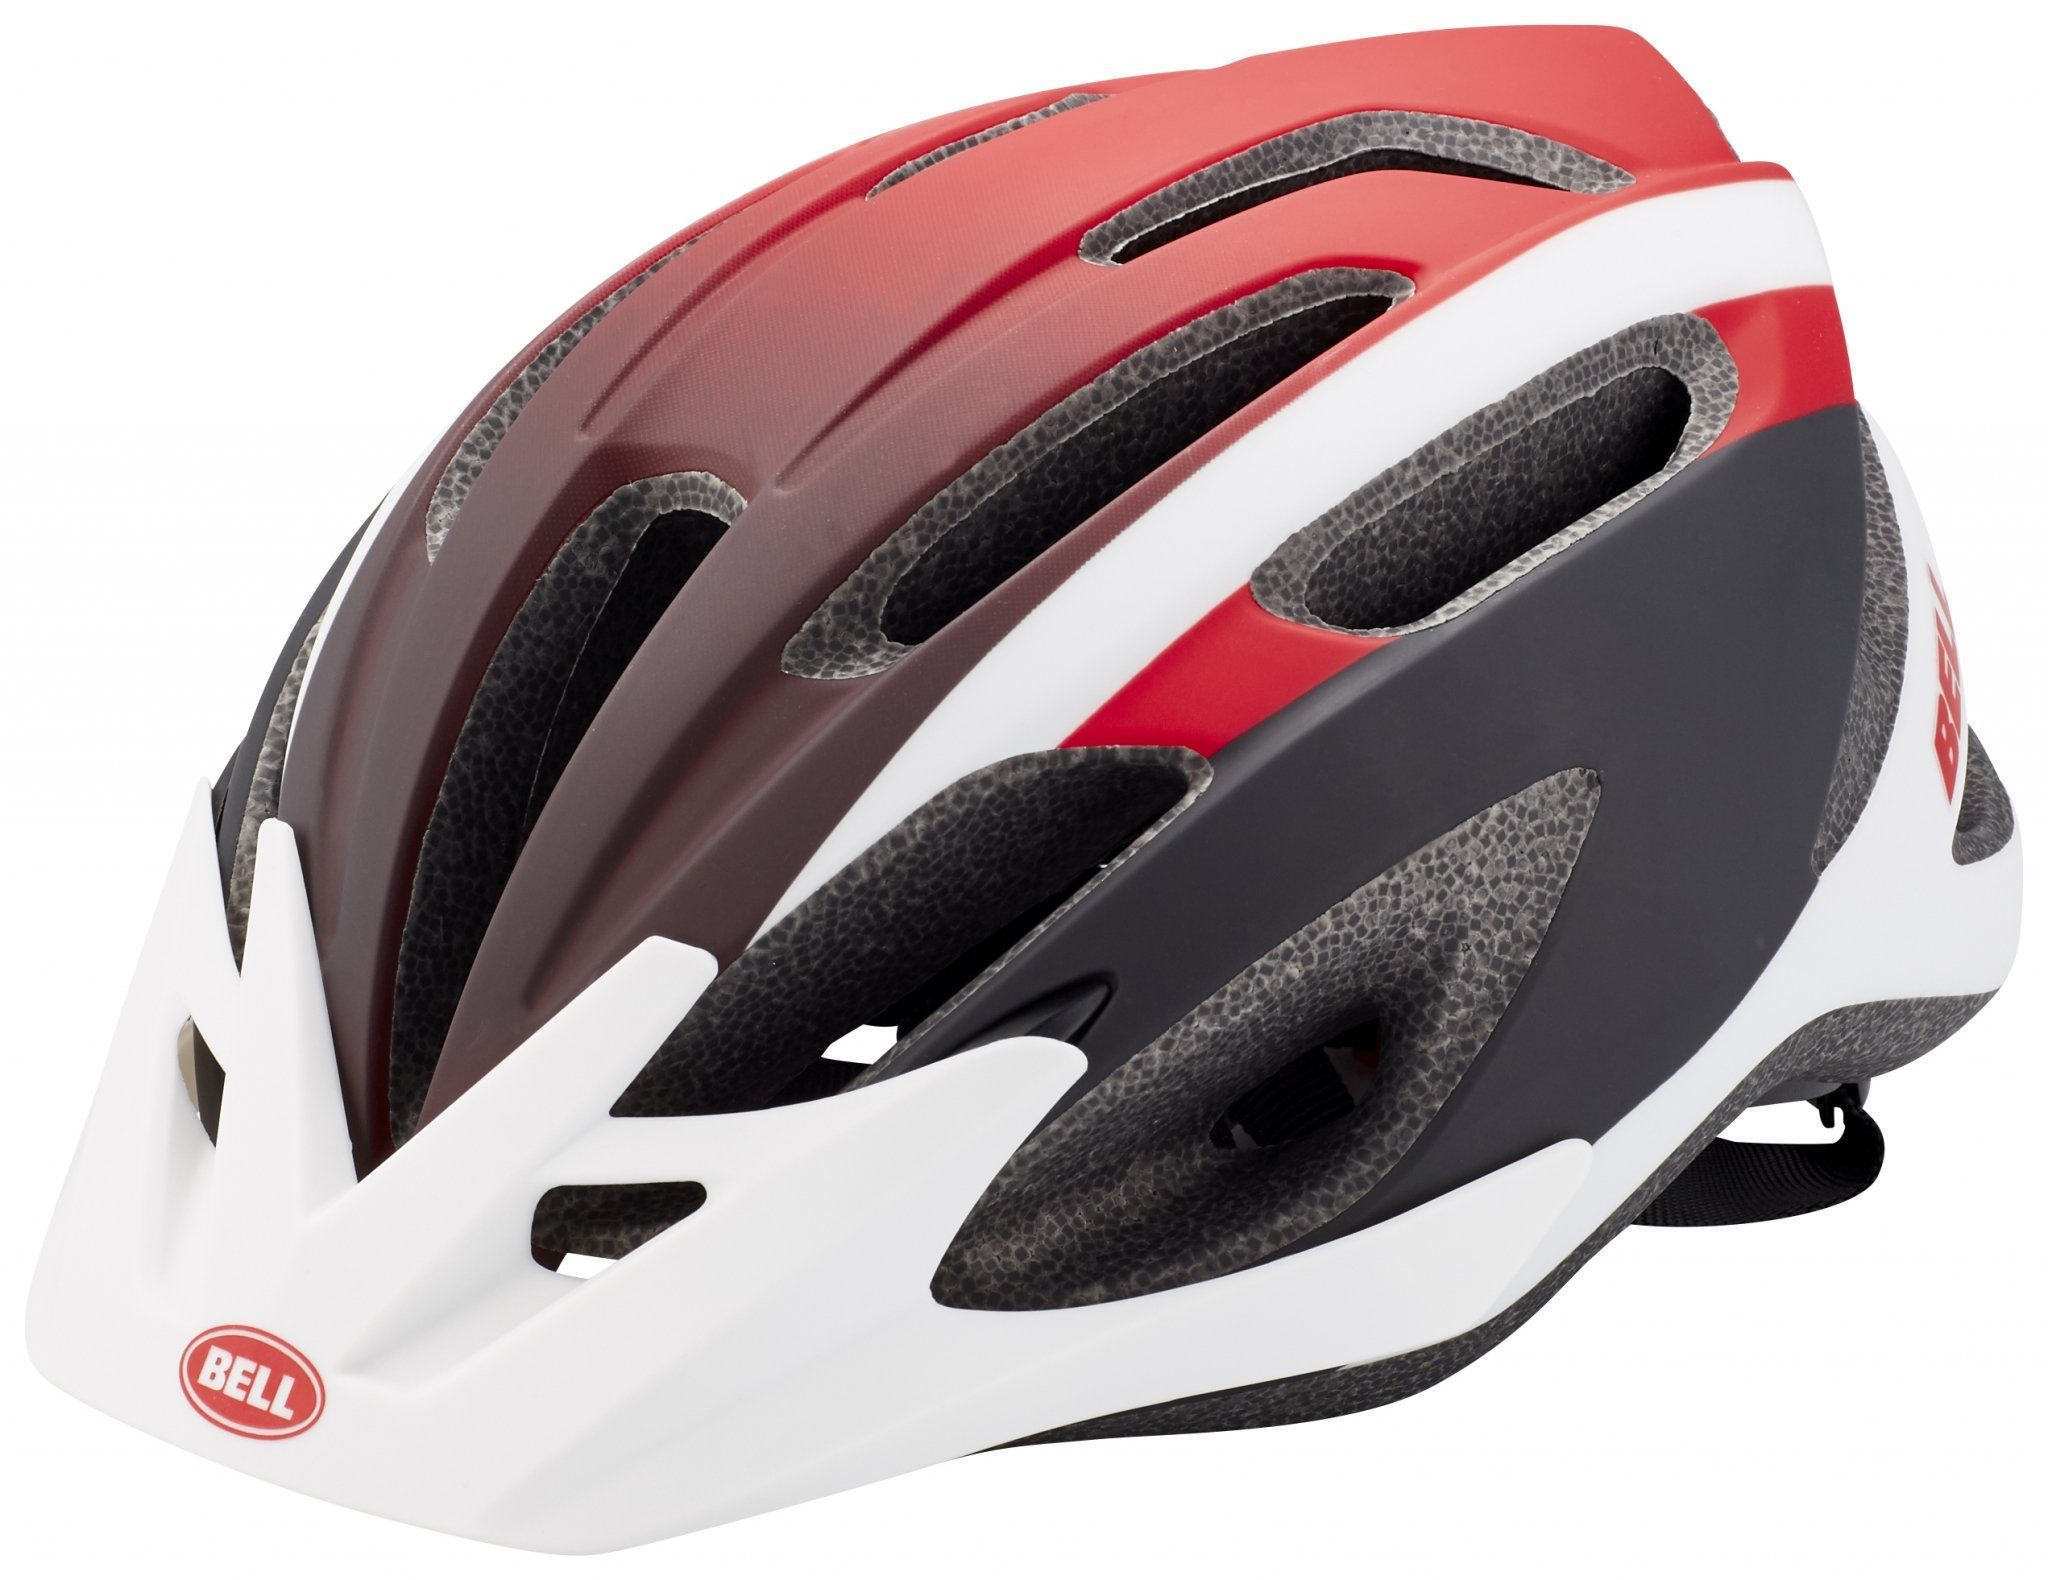 Bell Fahrradhelm »Crest Helmet unisize«